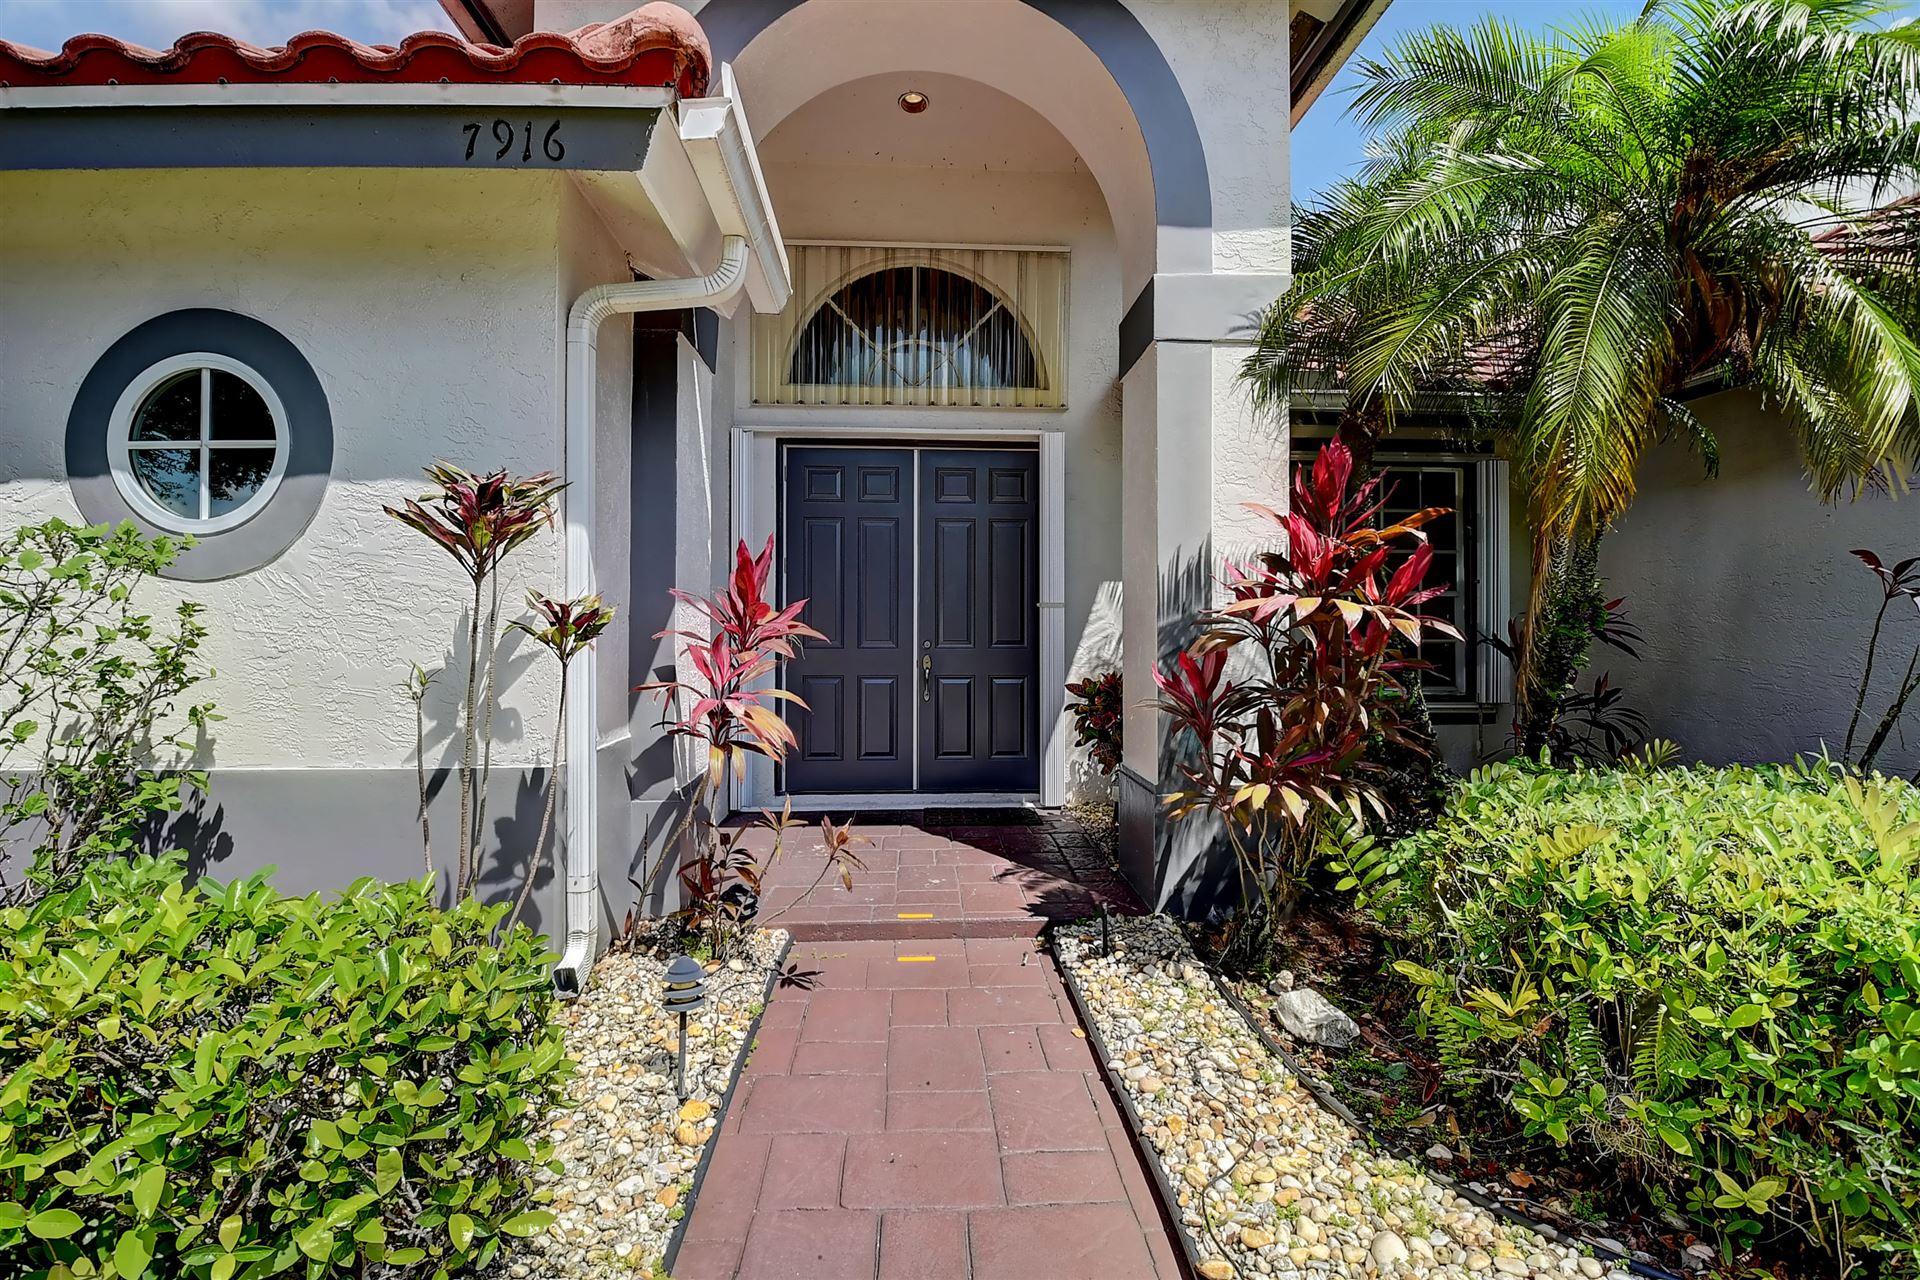 7916 Dorchester Road, Boynton Beach, FL 33472 - MLS#: RX-10713525